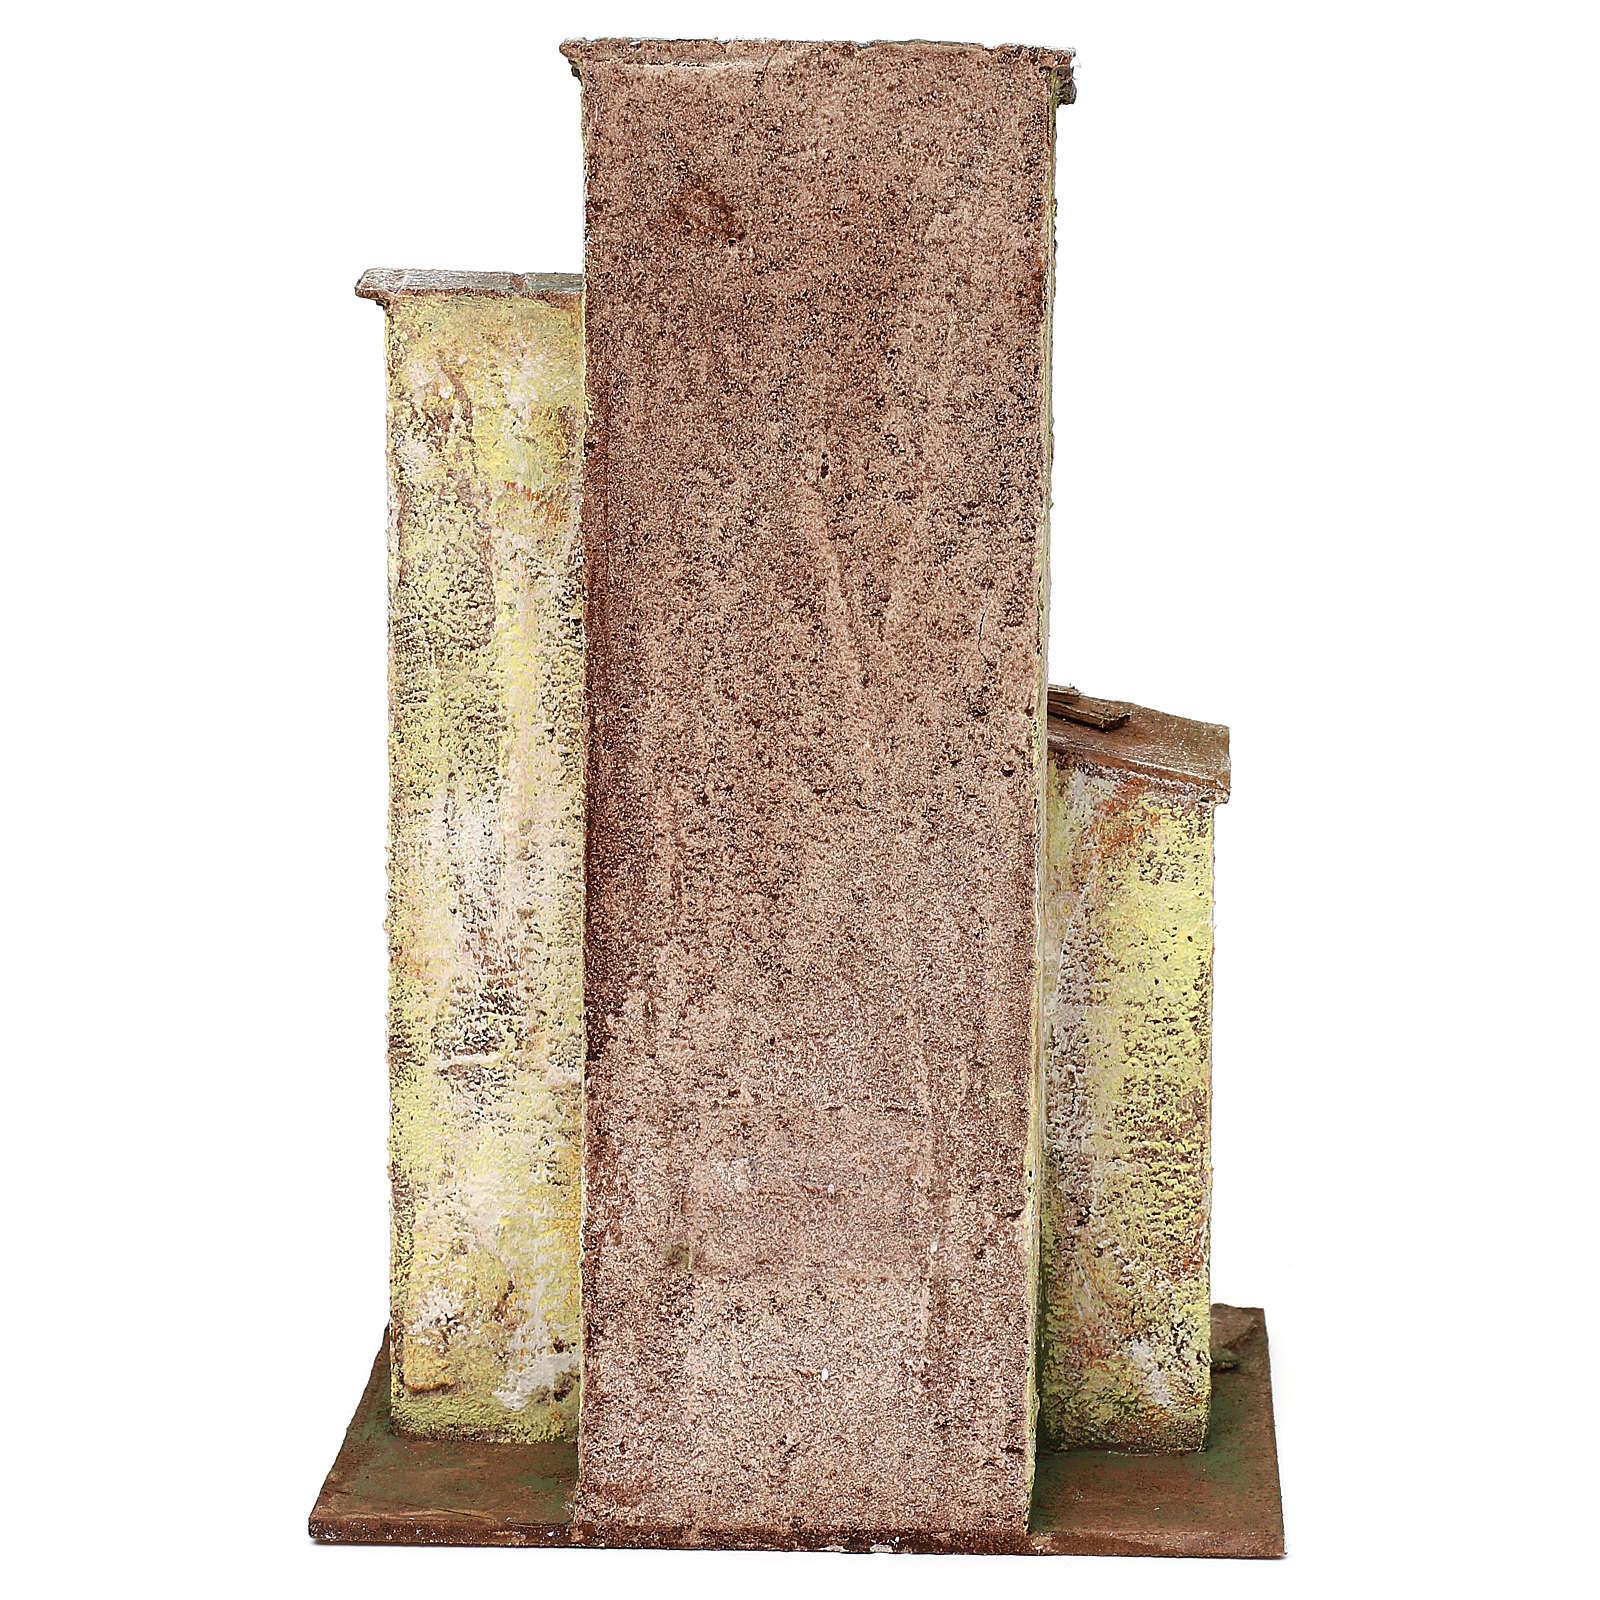 Casita con 3 pisos de 30x20x15 cm para belén de 10 cm 4